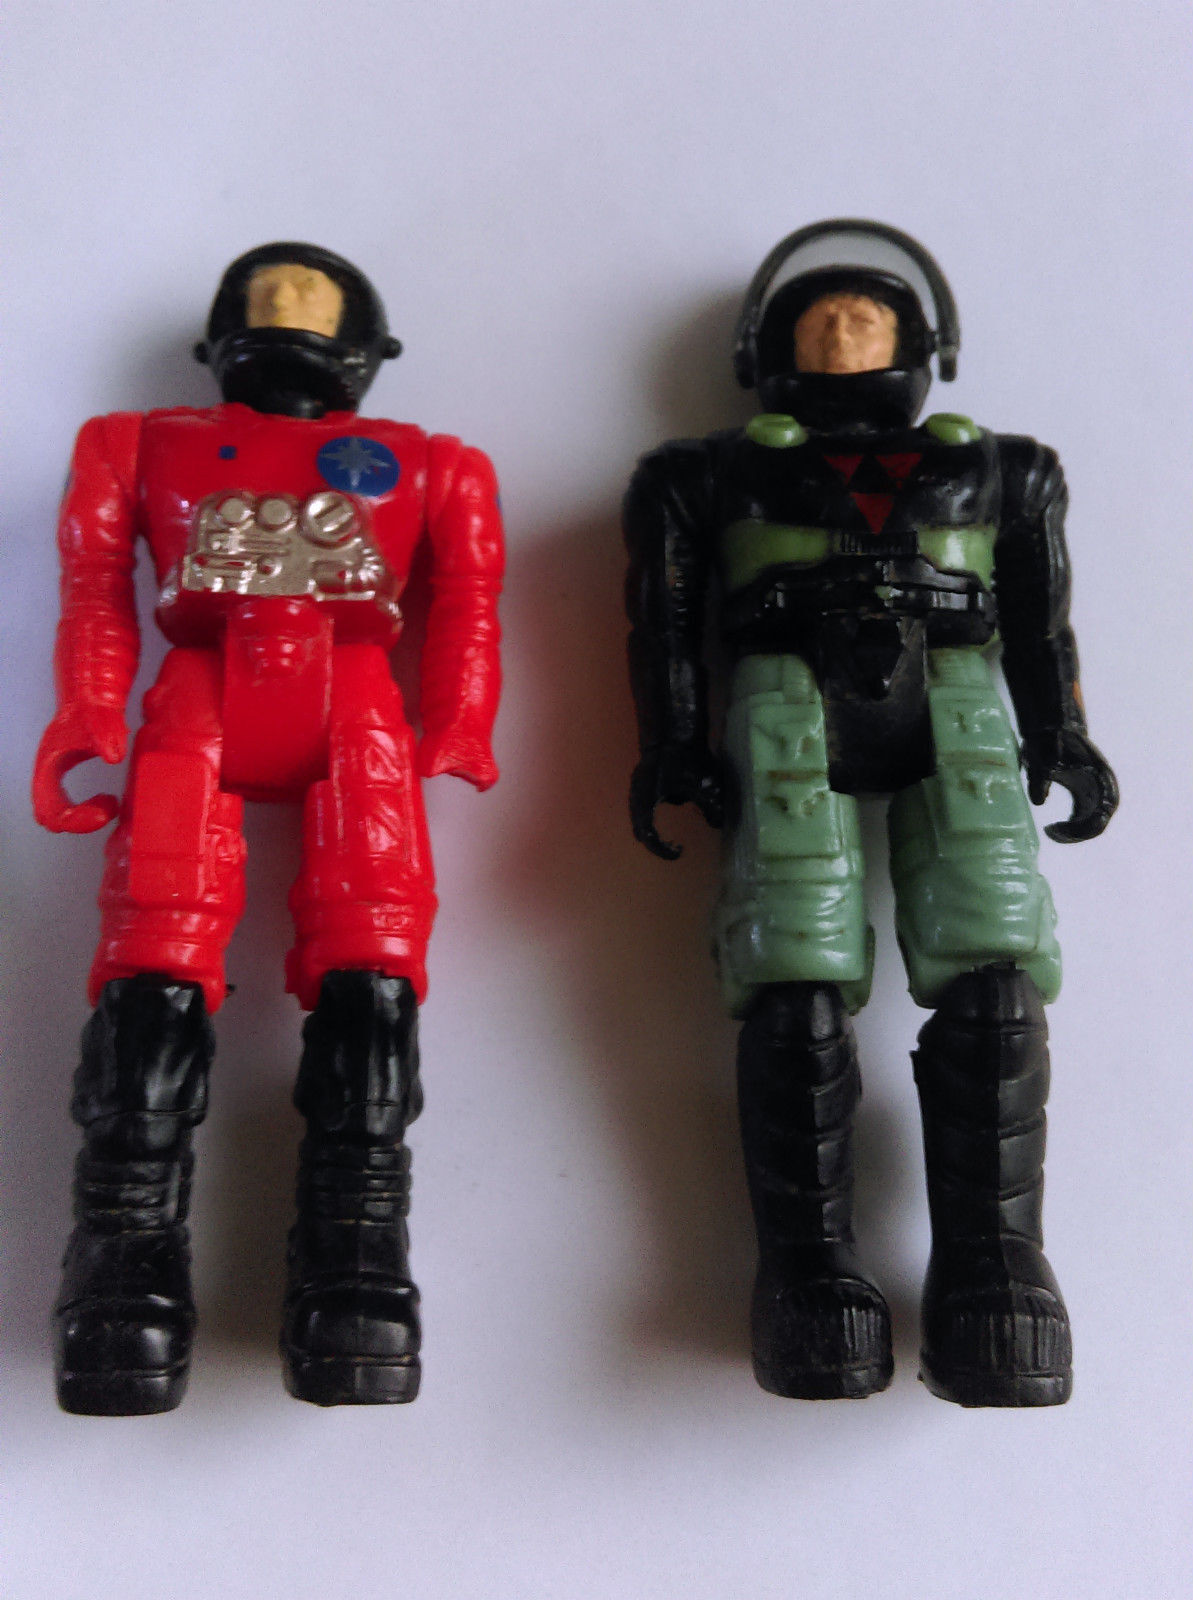 Vintage 1980's Starcom Figures - LT. VASOR and PFC. SHAWN REED